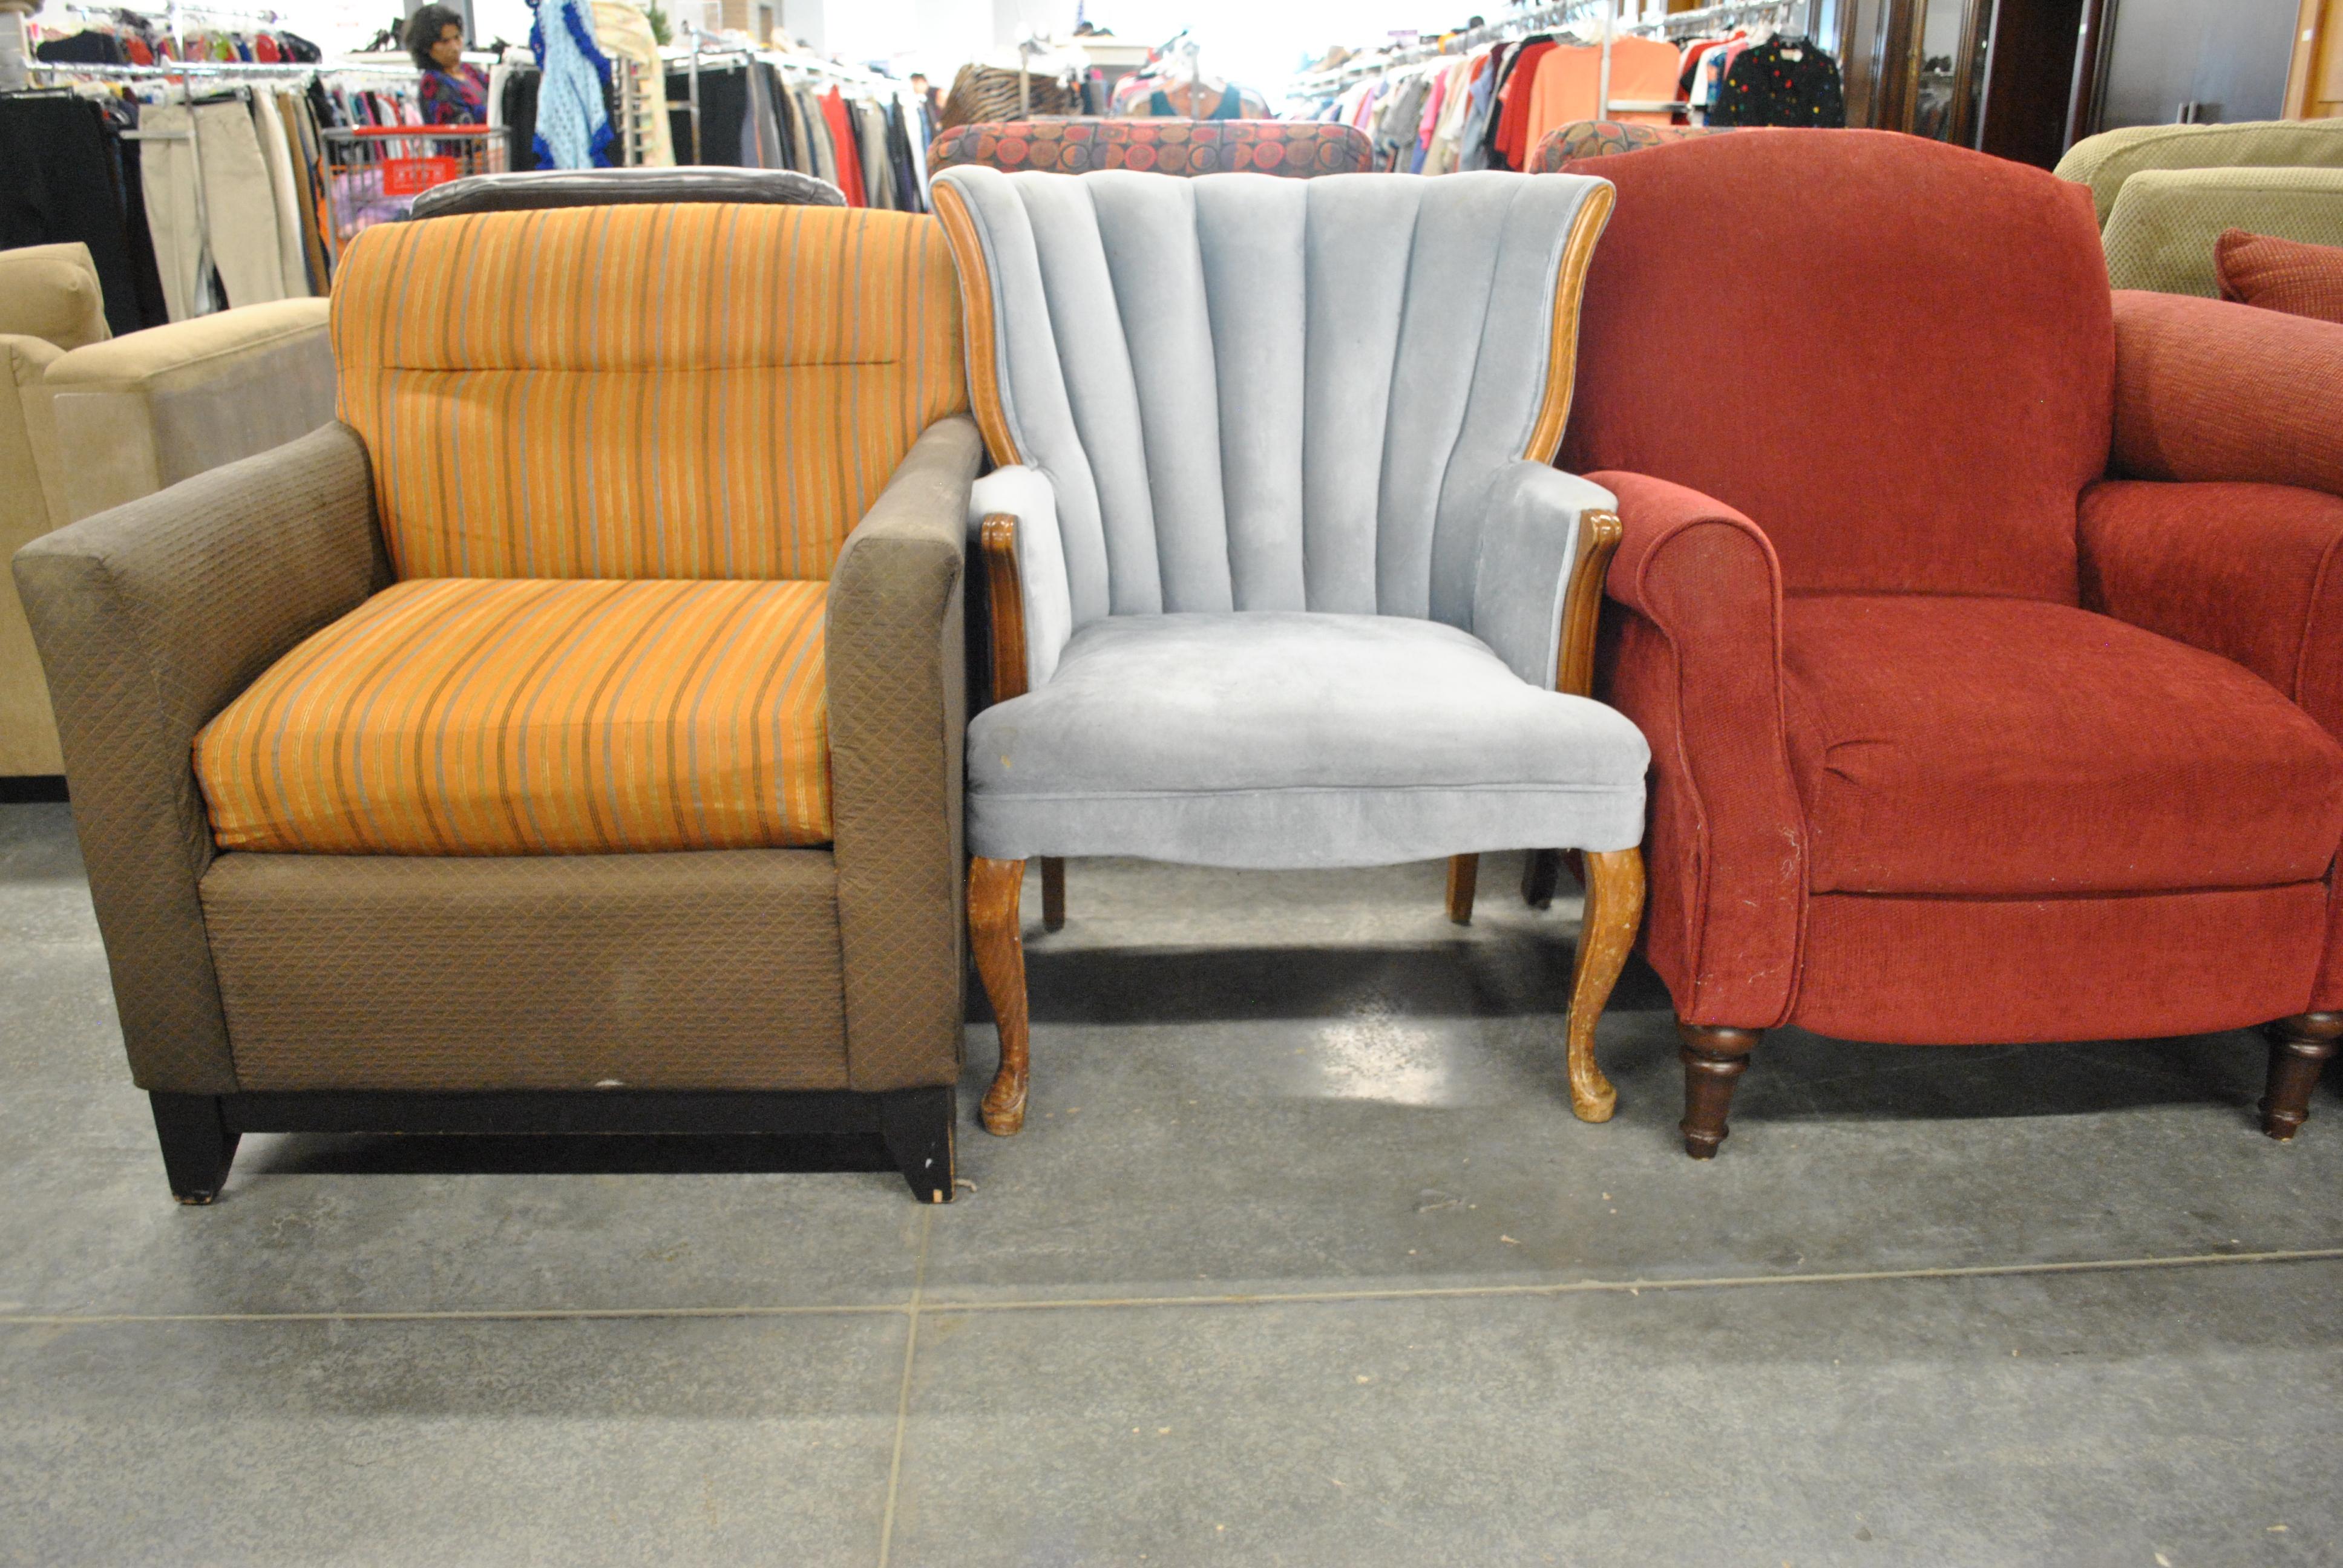 Chairs_-_resale.JPG